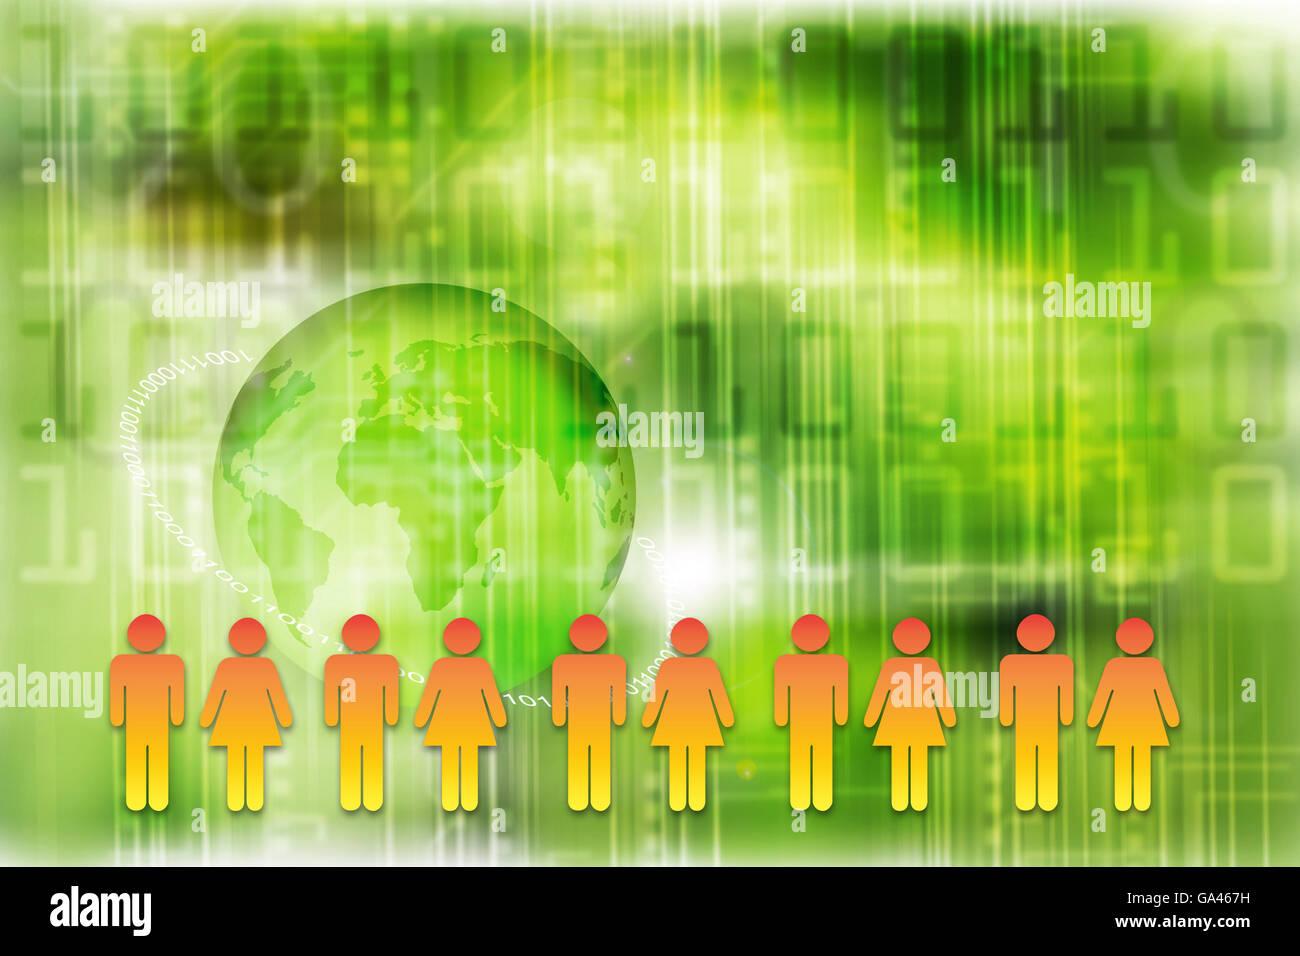 social media concept illustration - Stock Image